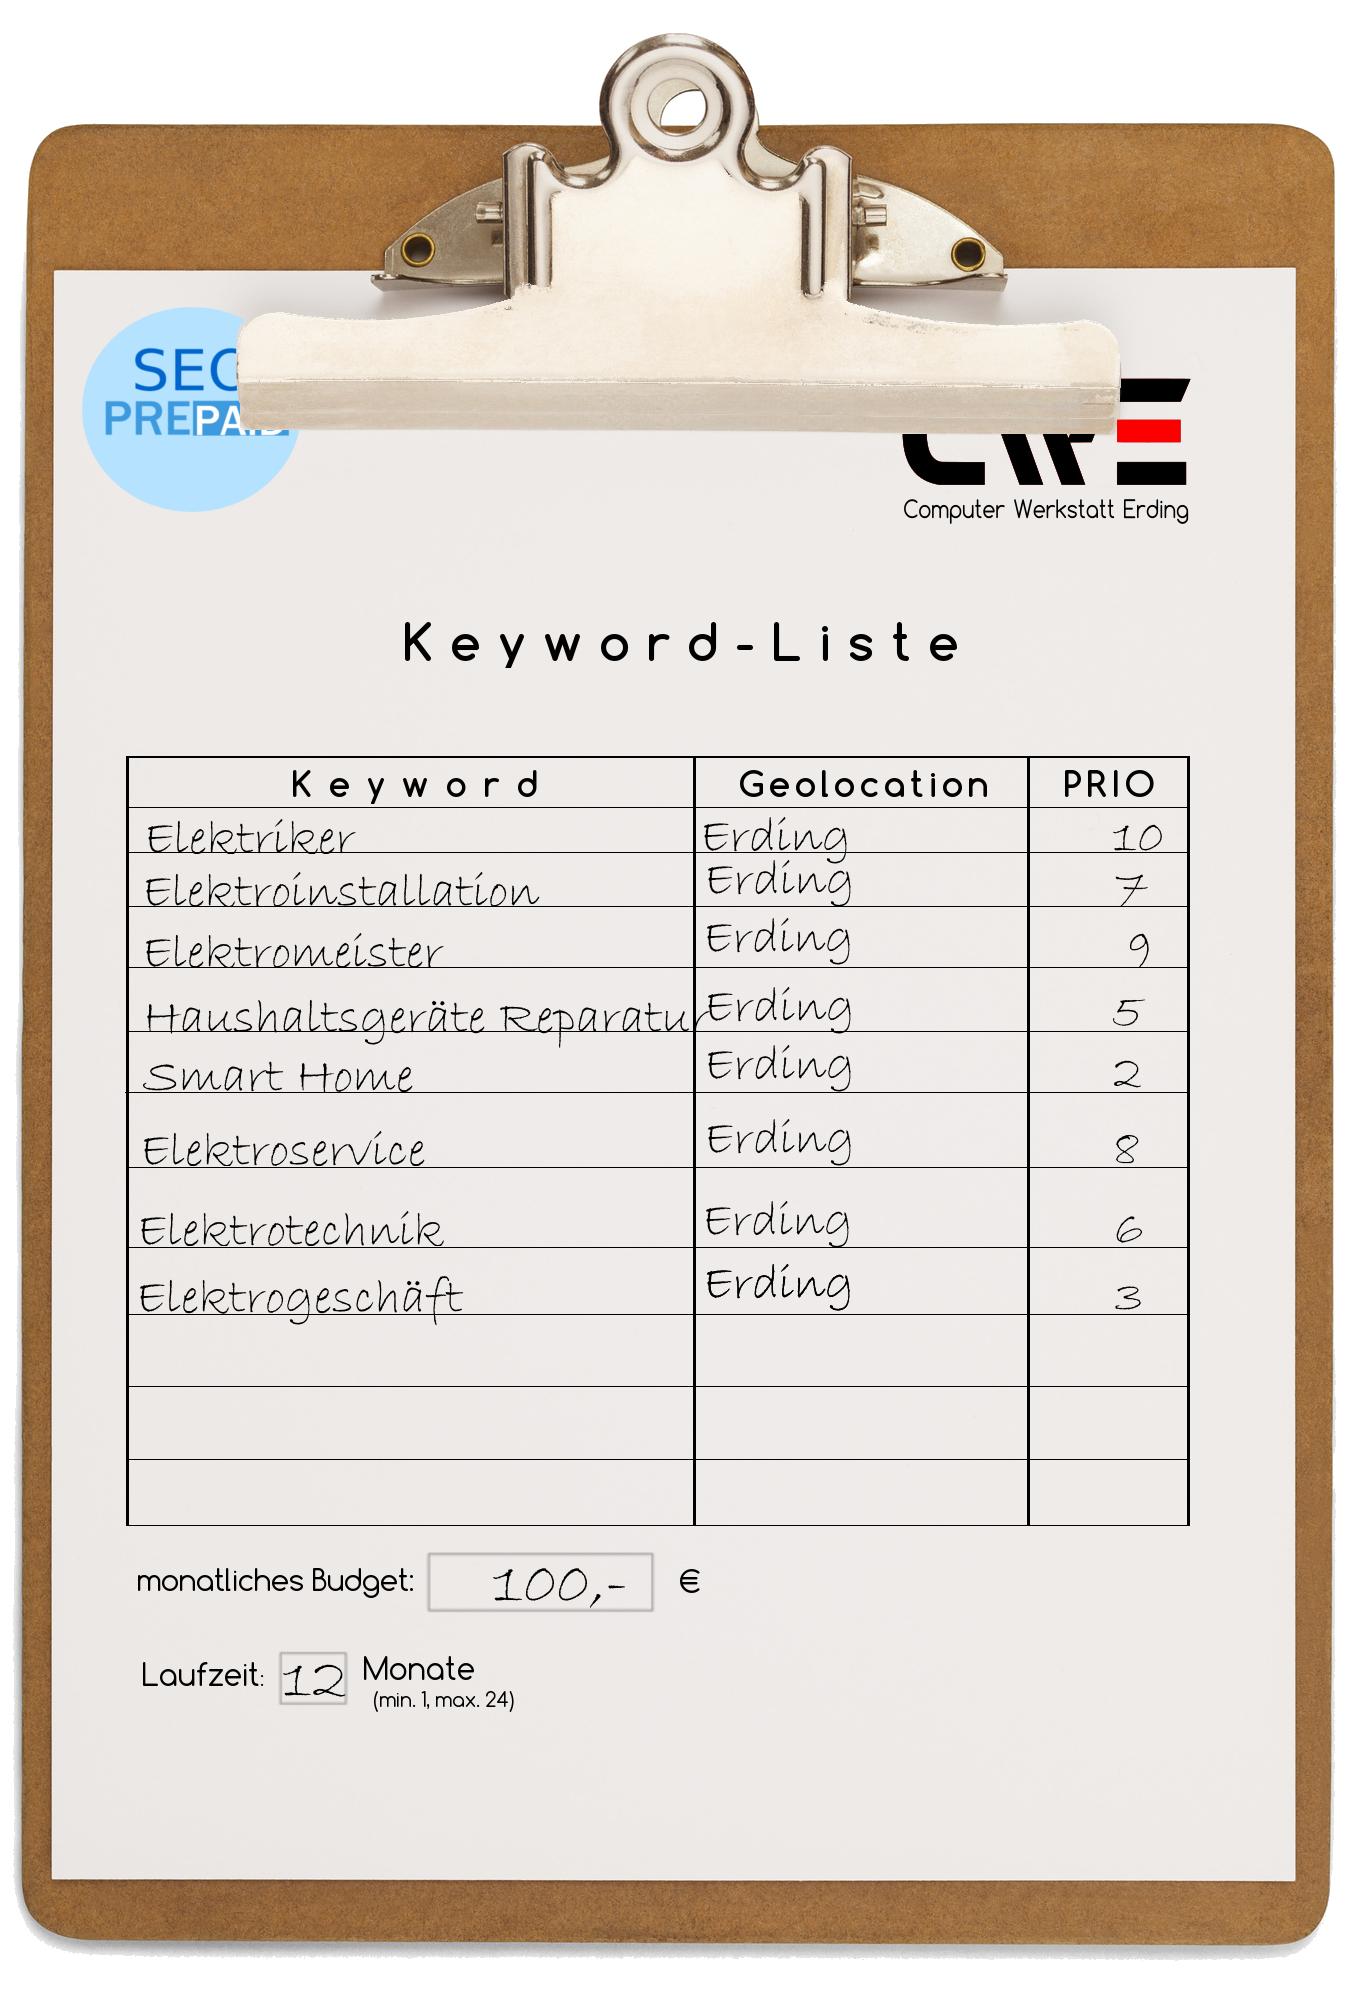 Keywordliste für Erding